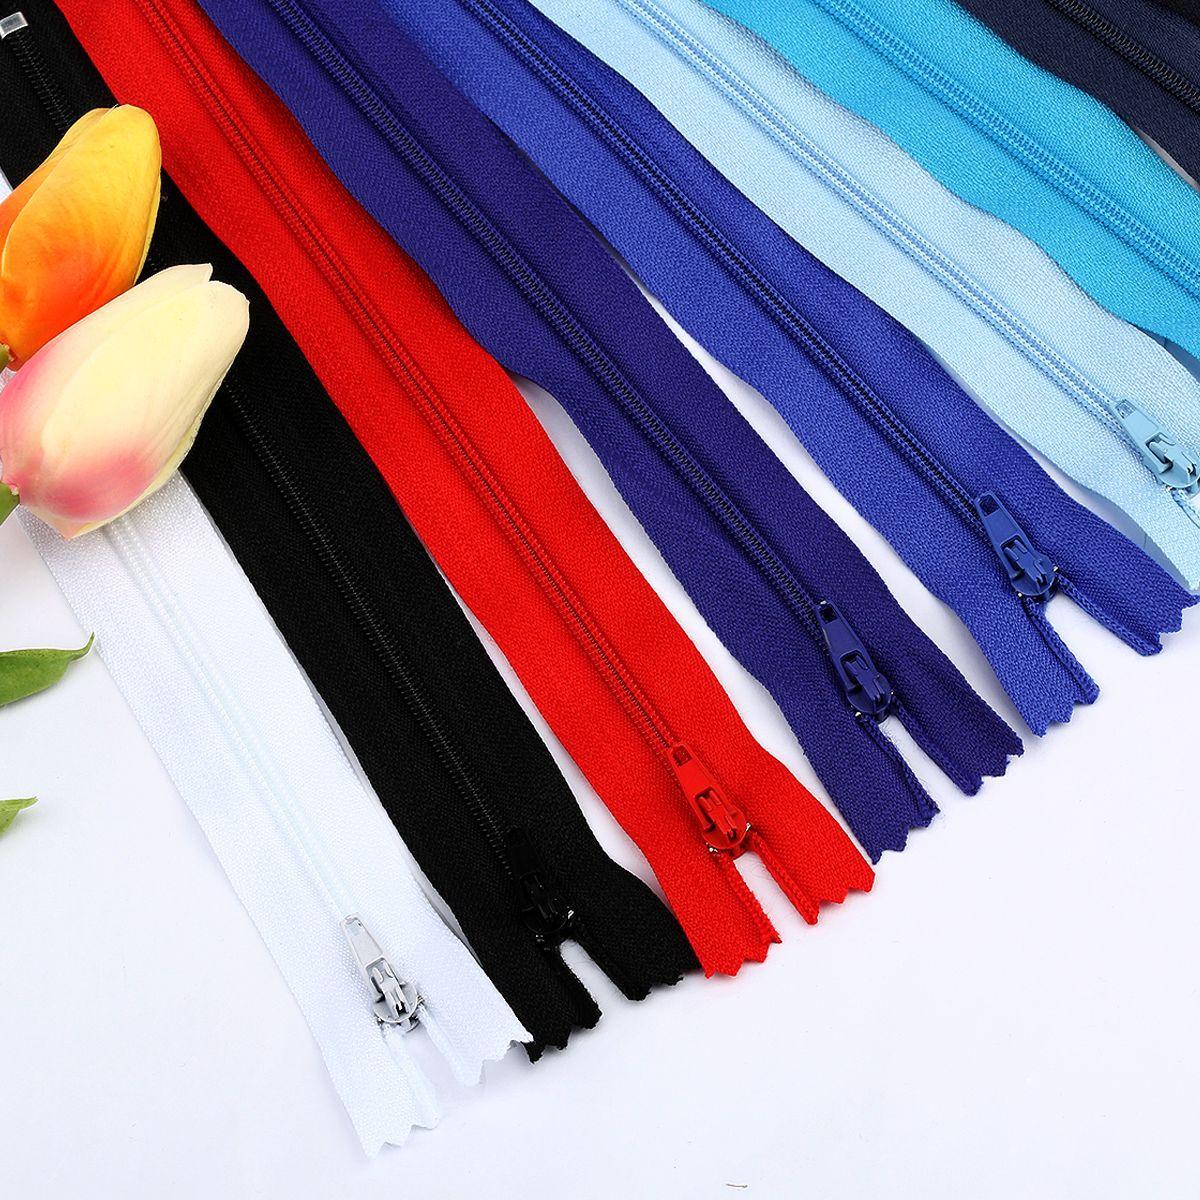 Luggage pants 20cm nylon zipper 20cm 40 kinds of large number 3 closed zipper